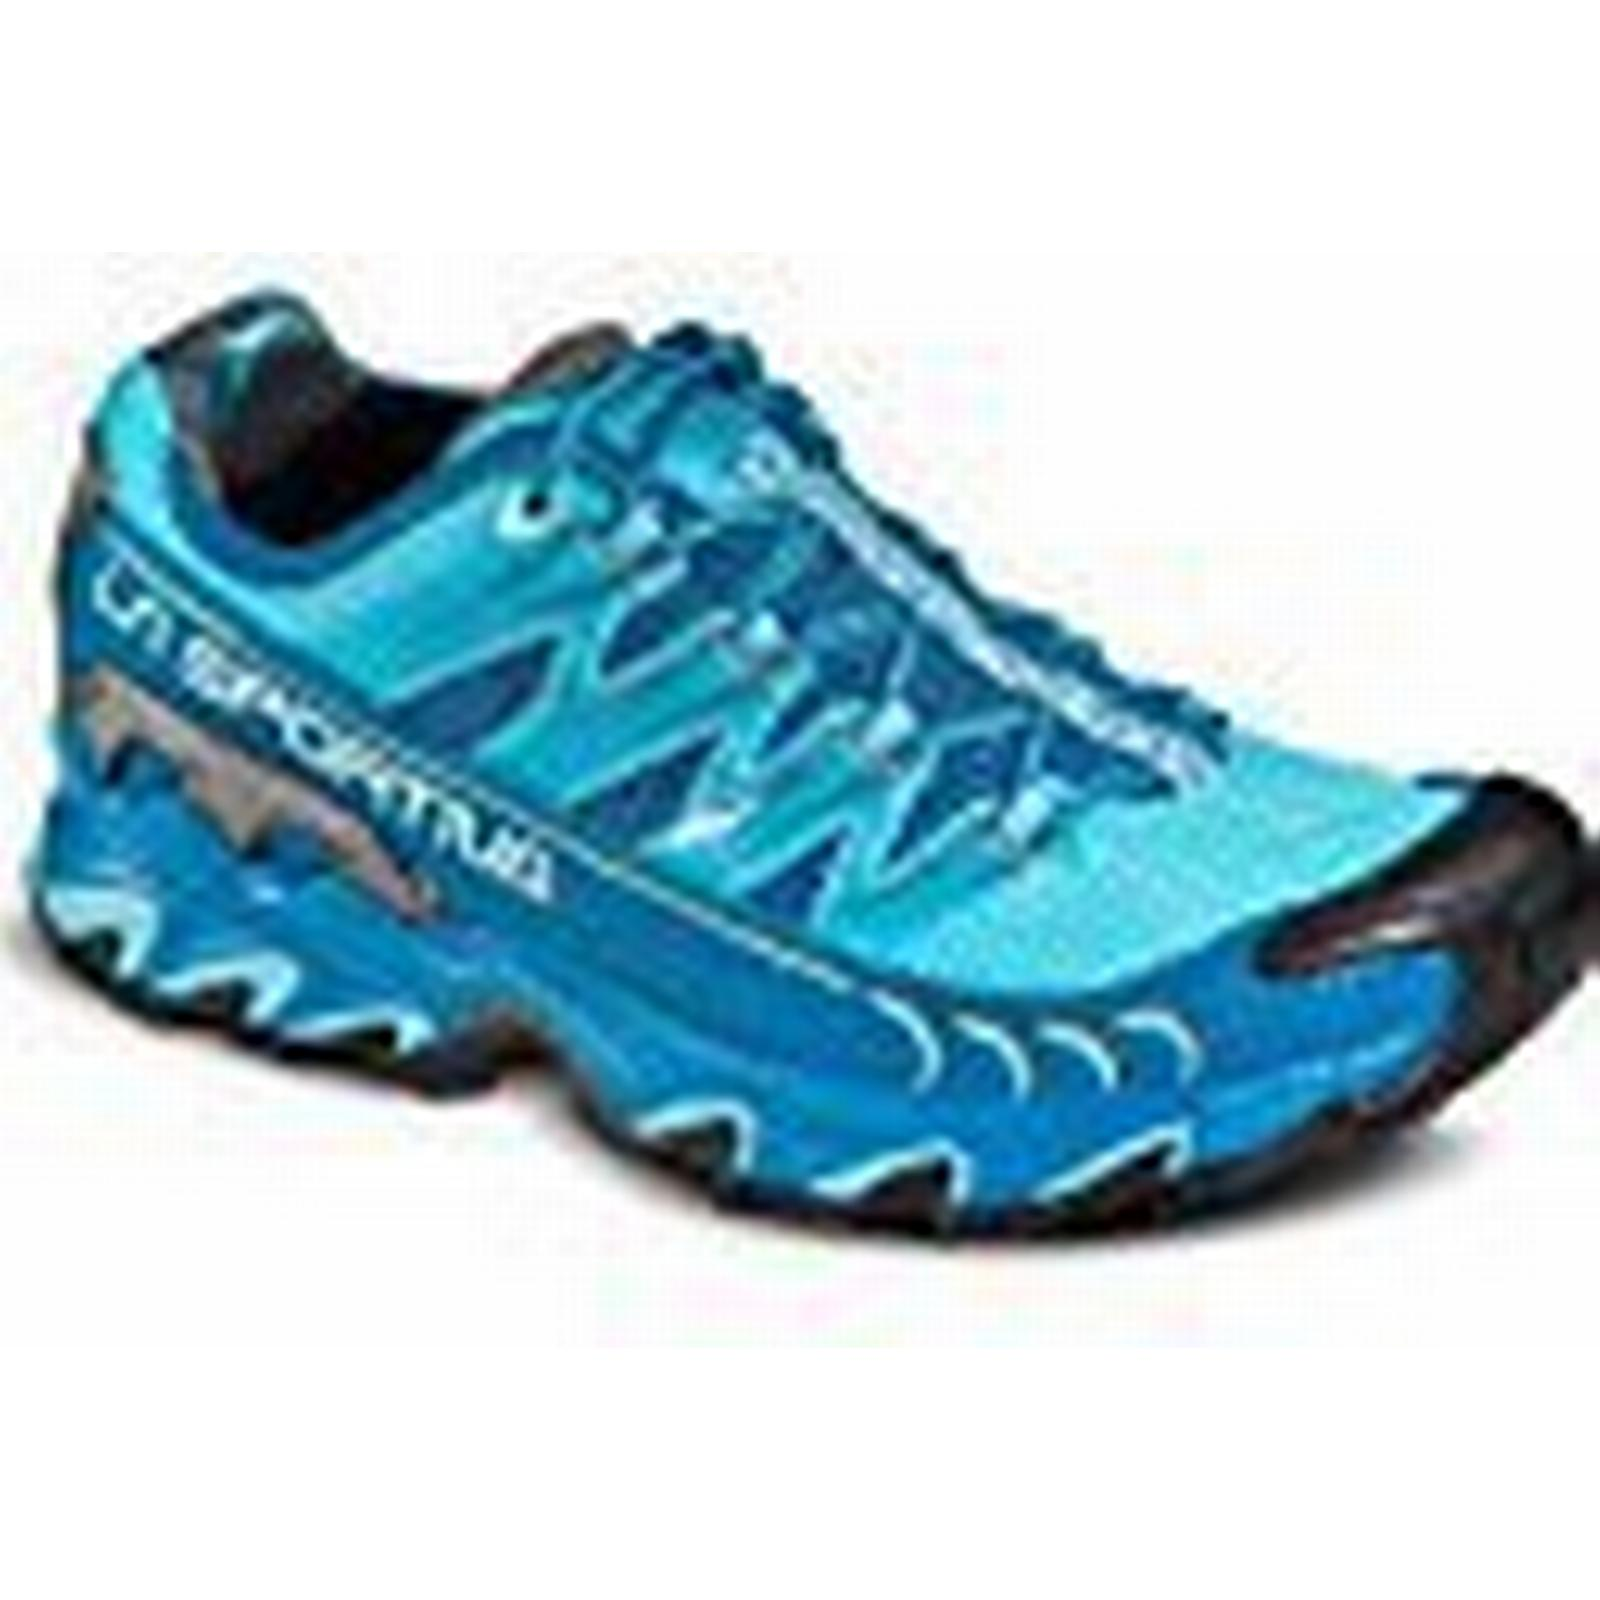 La Blue Sportiva Men's Running Shoes Blue La Blue Size:37 3a36cd